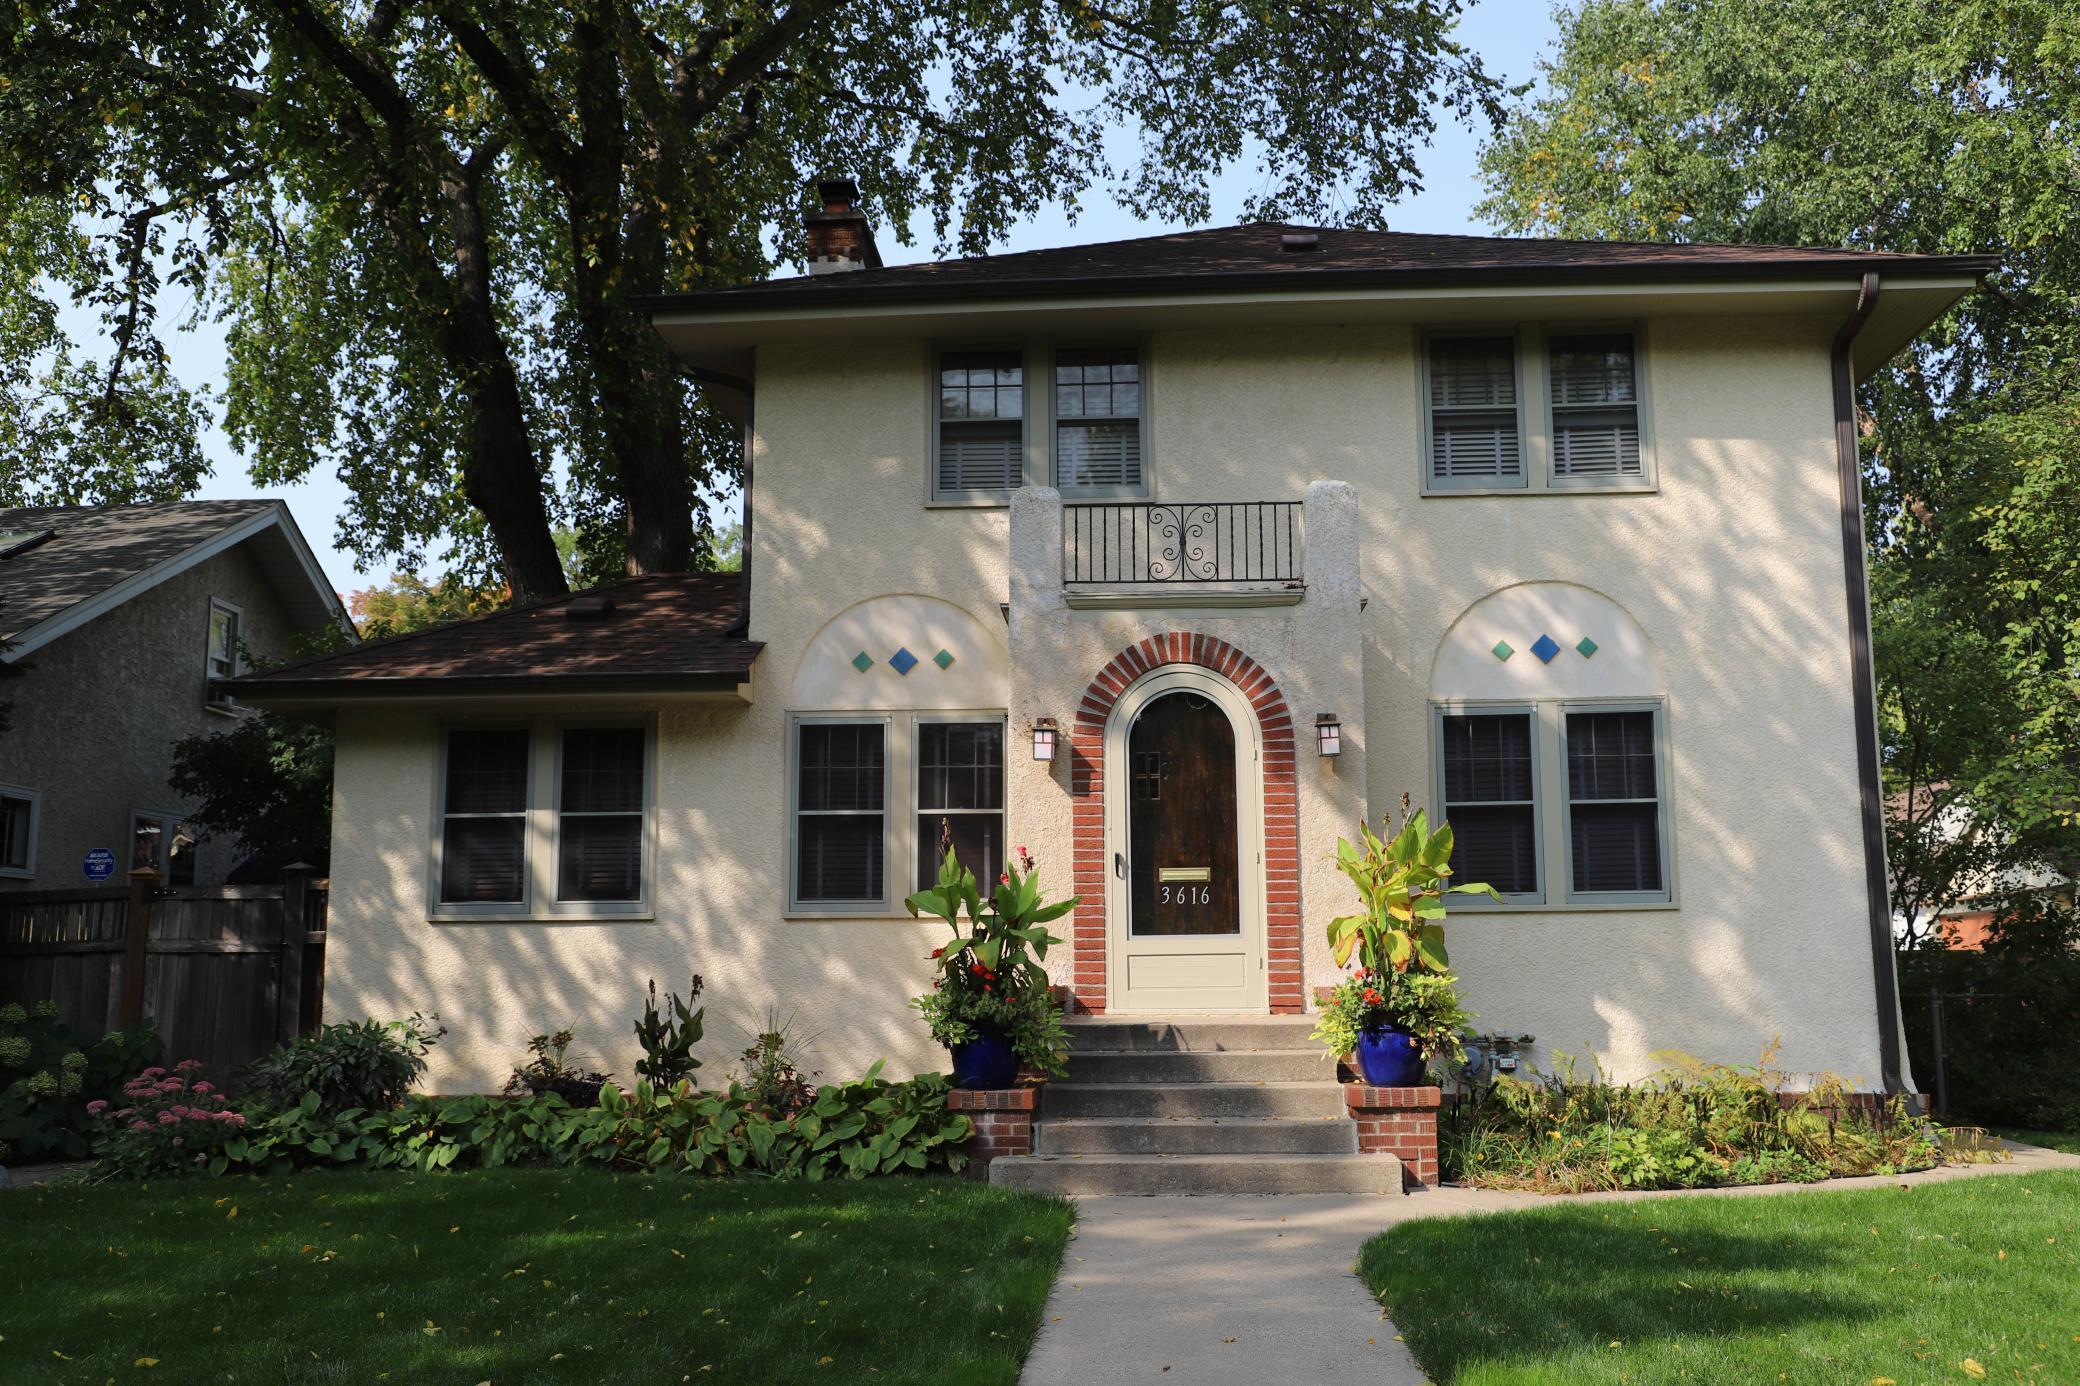 3616 46th Avenue S Property Photo - Minneapolis, MN real estate listing